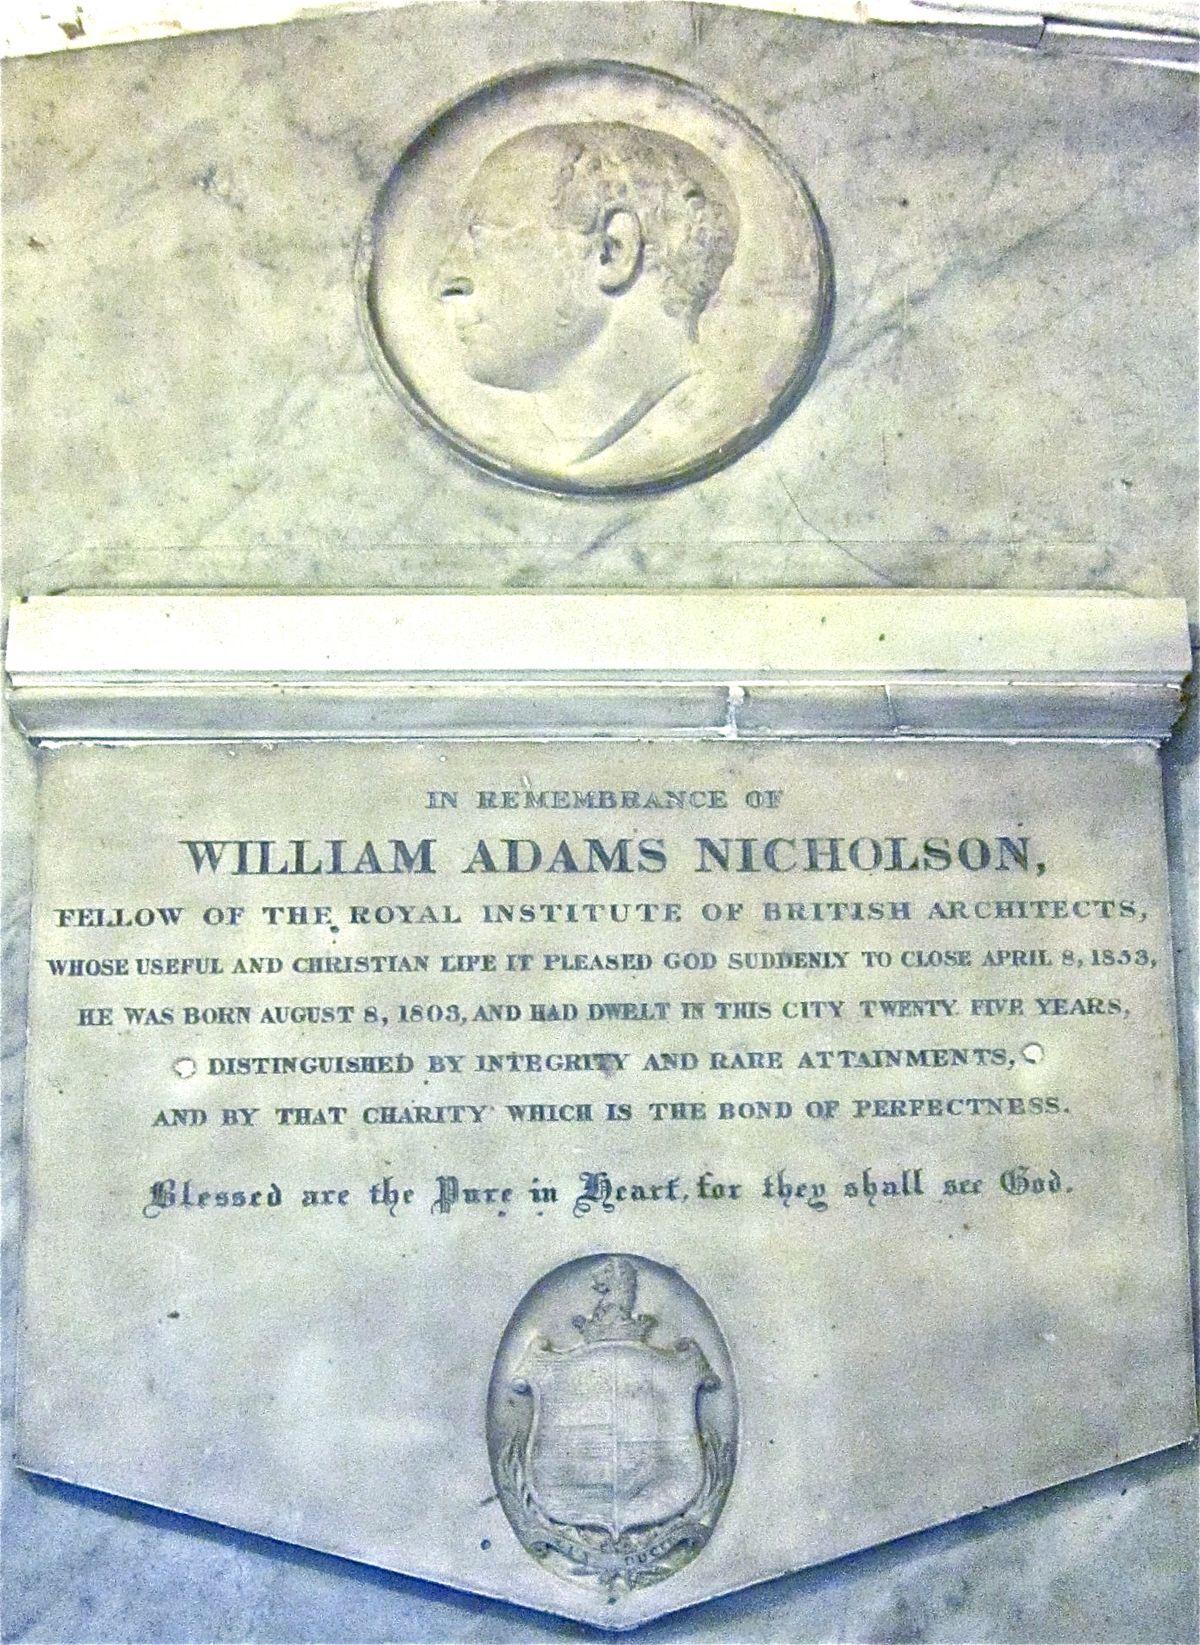 William Adams Nicholson - Wikipedia